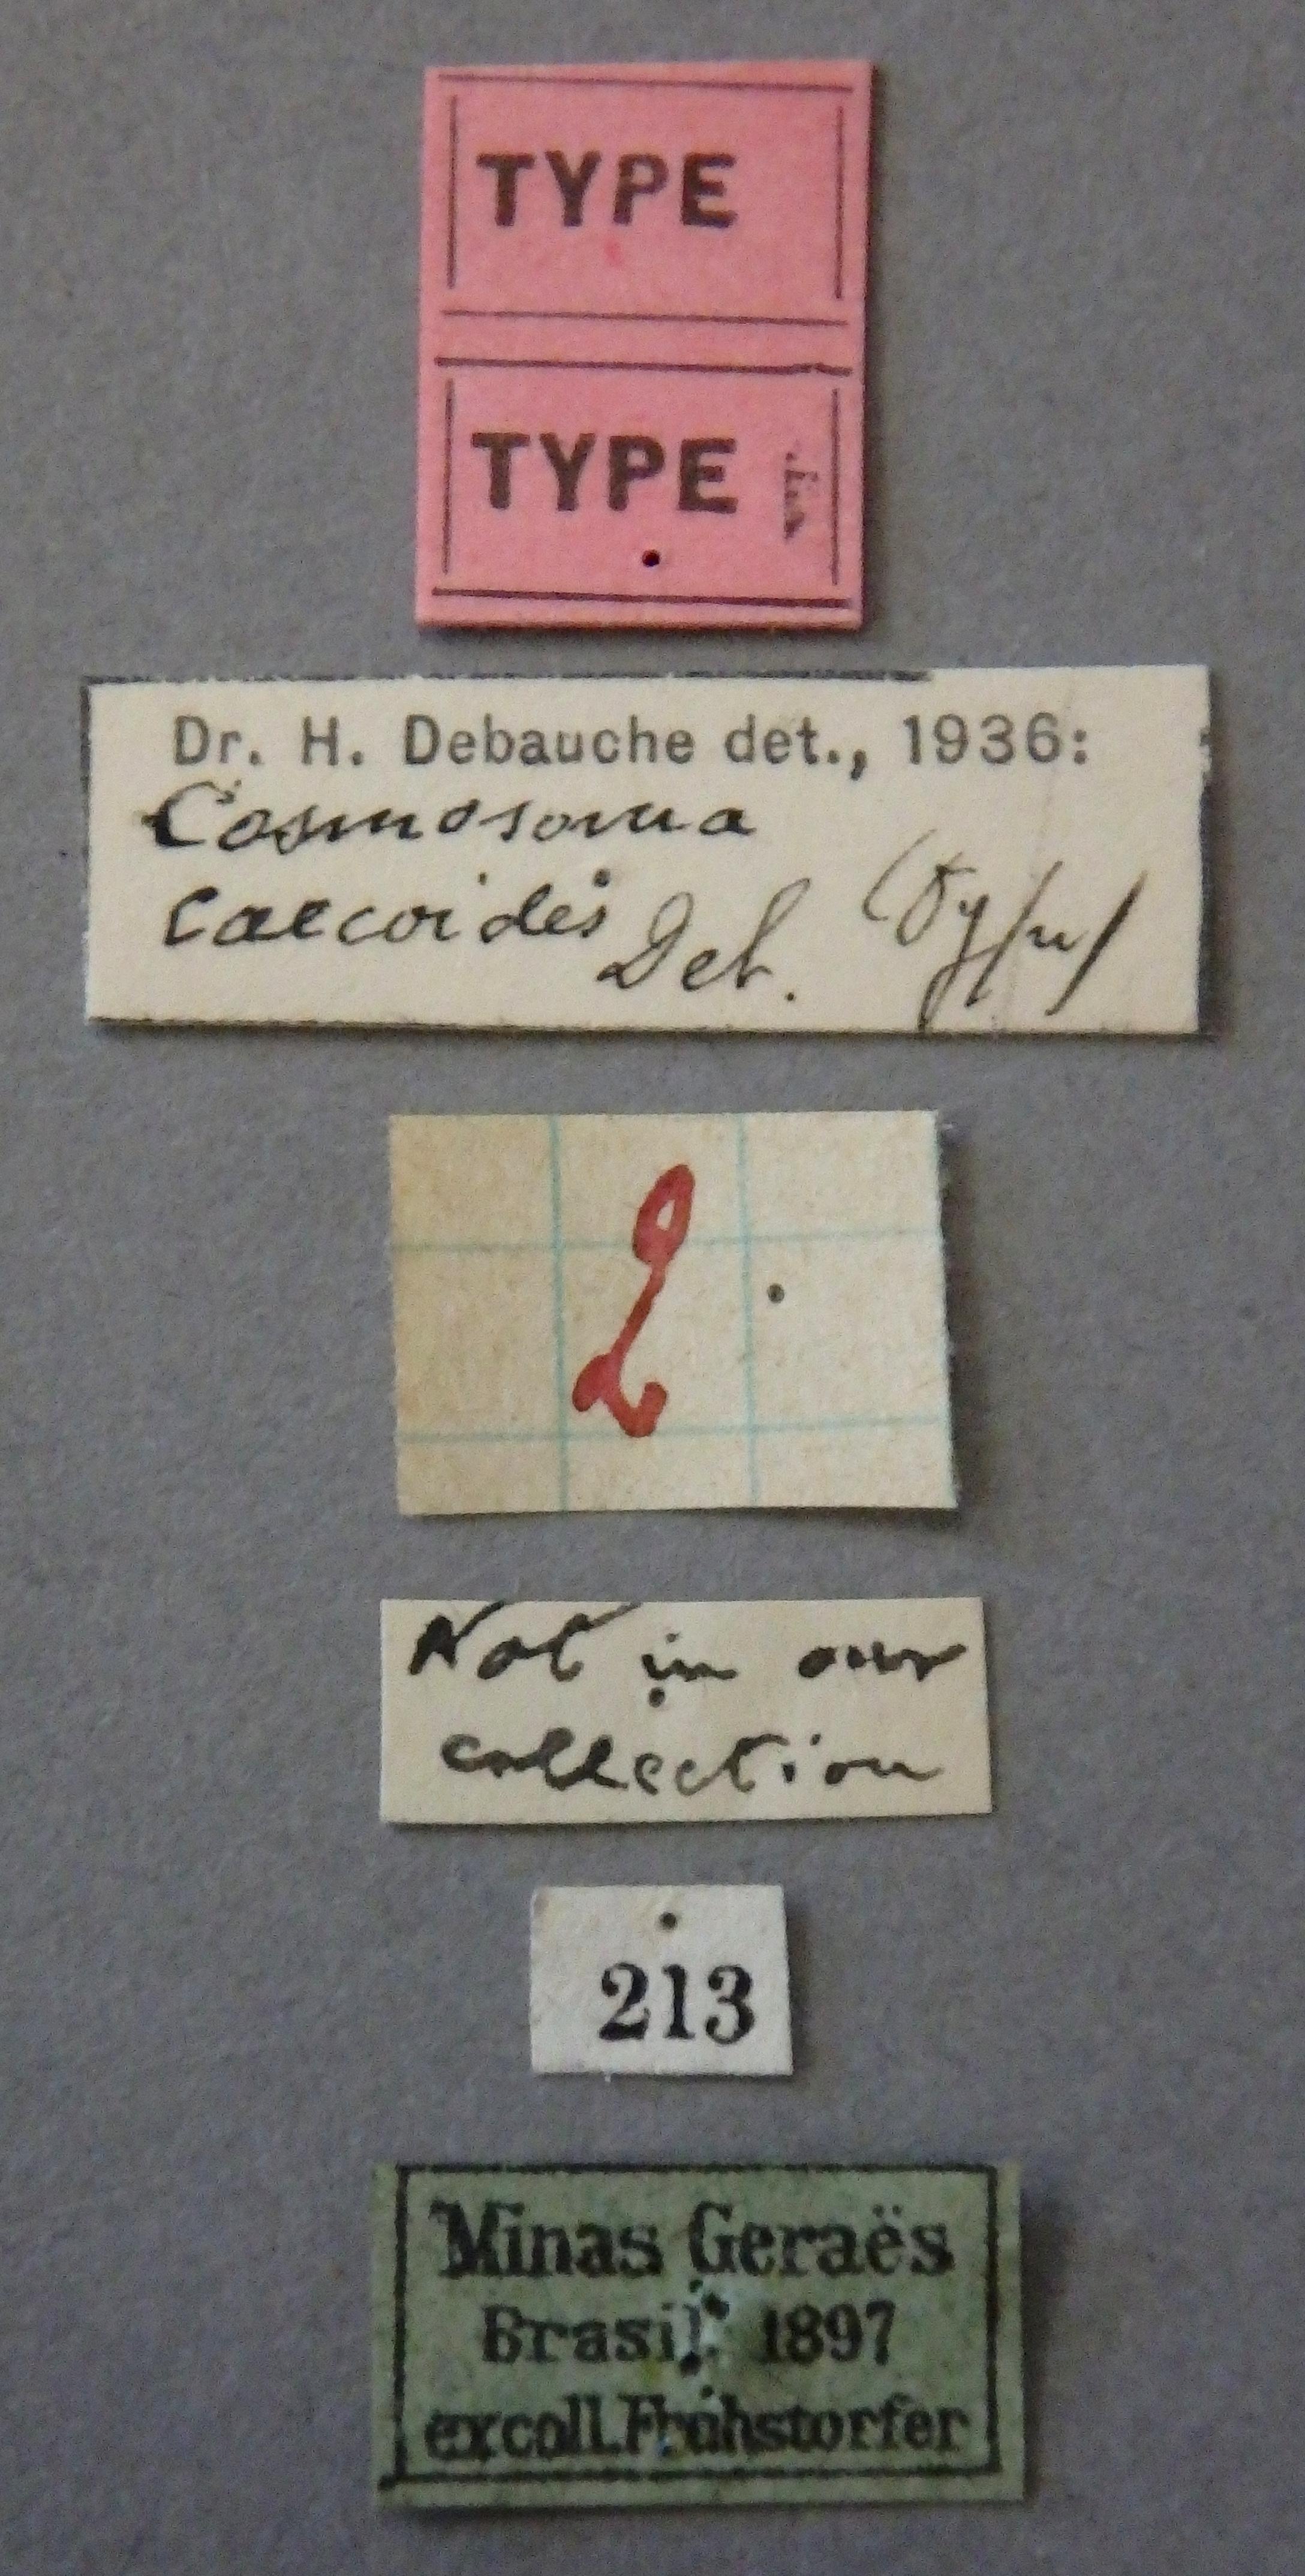 Cosmosoma caecoides t Lb .JPG